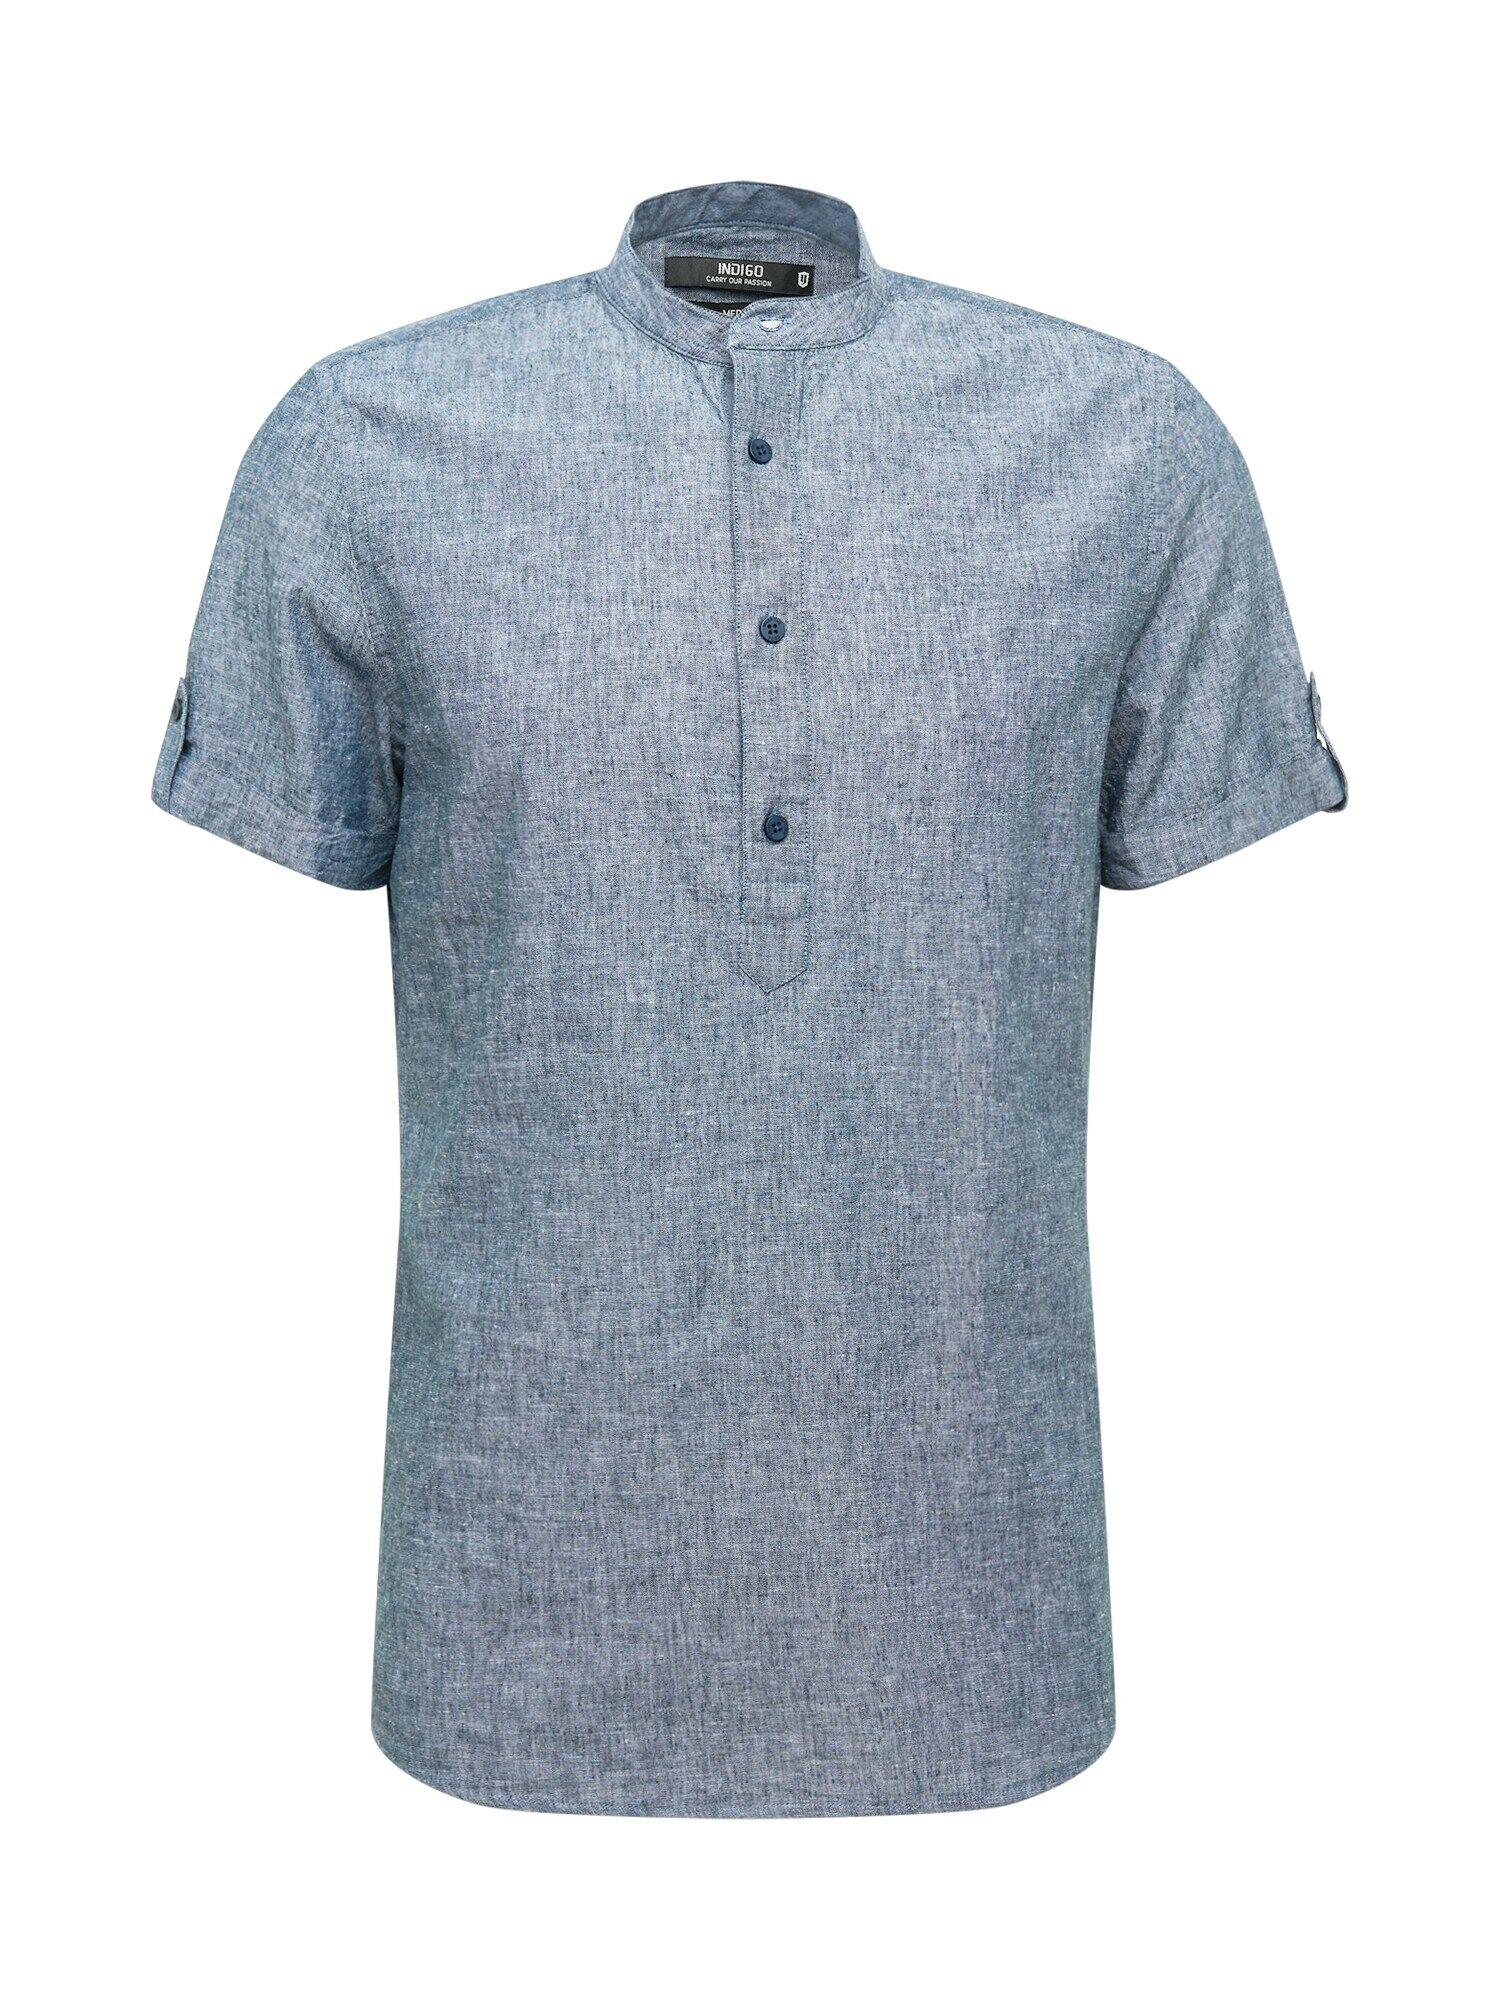 INDICODE JEANS Camicia 'Mao' Blu